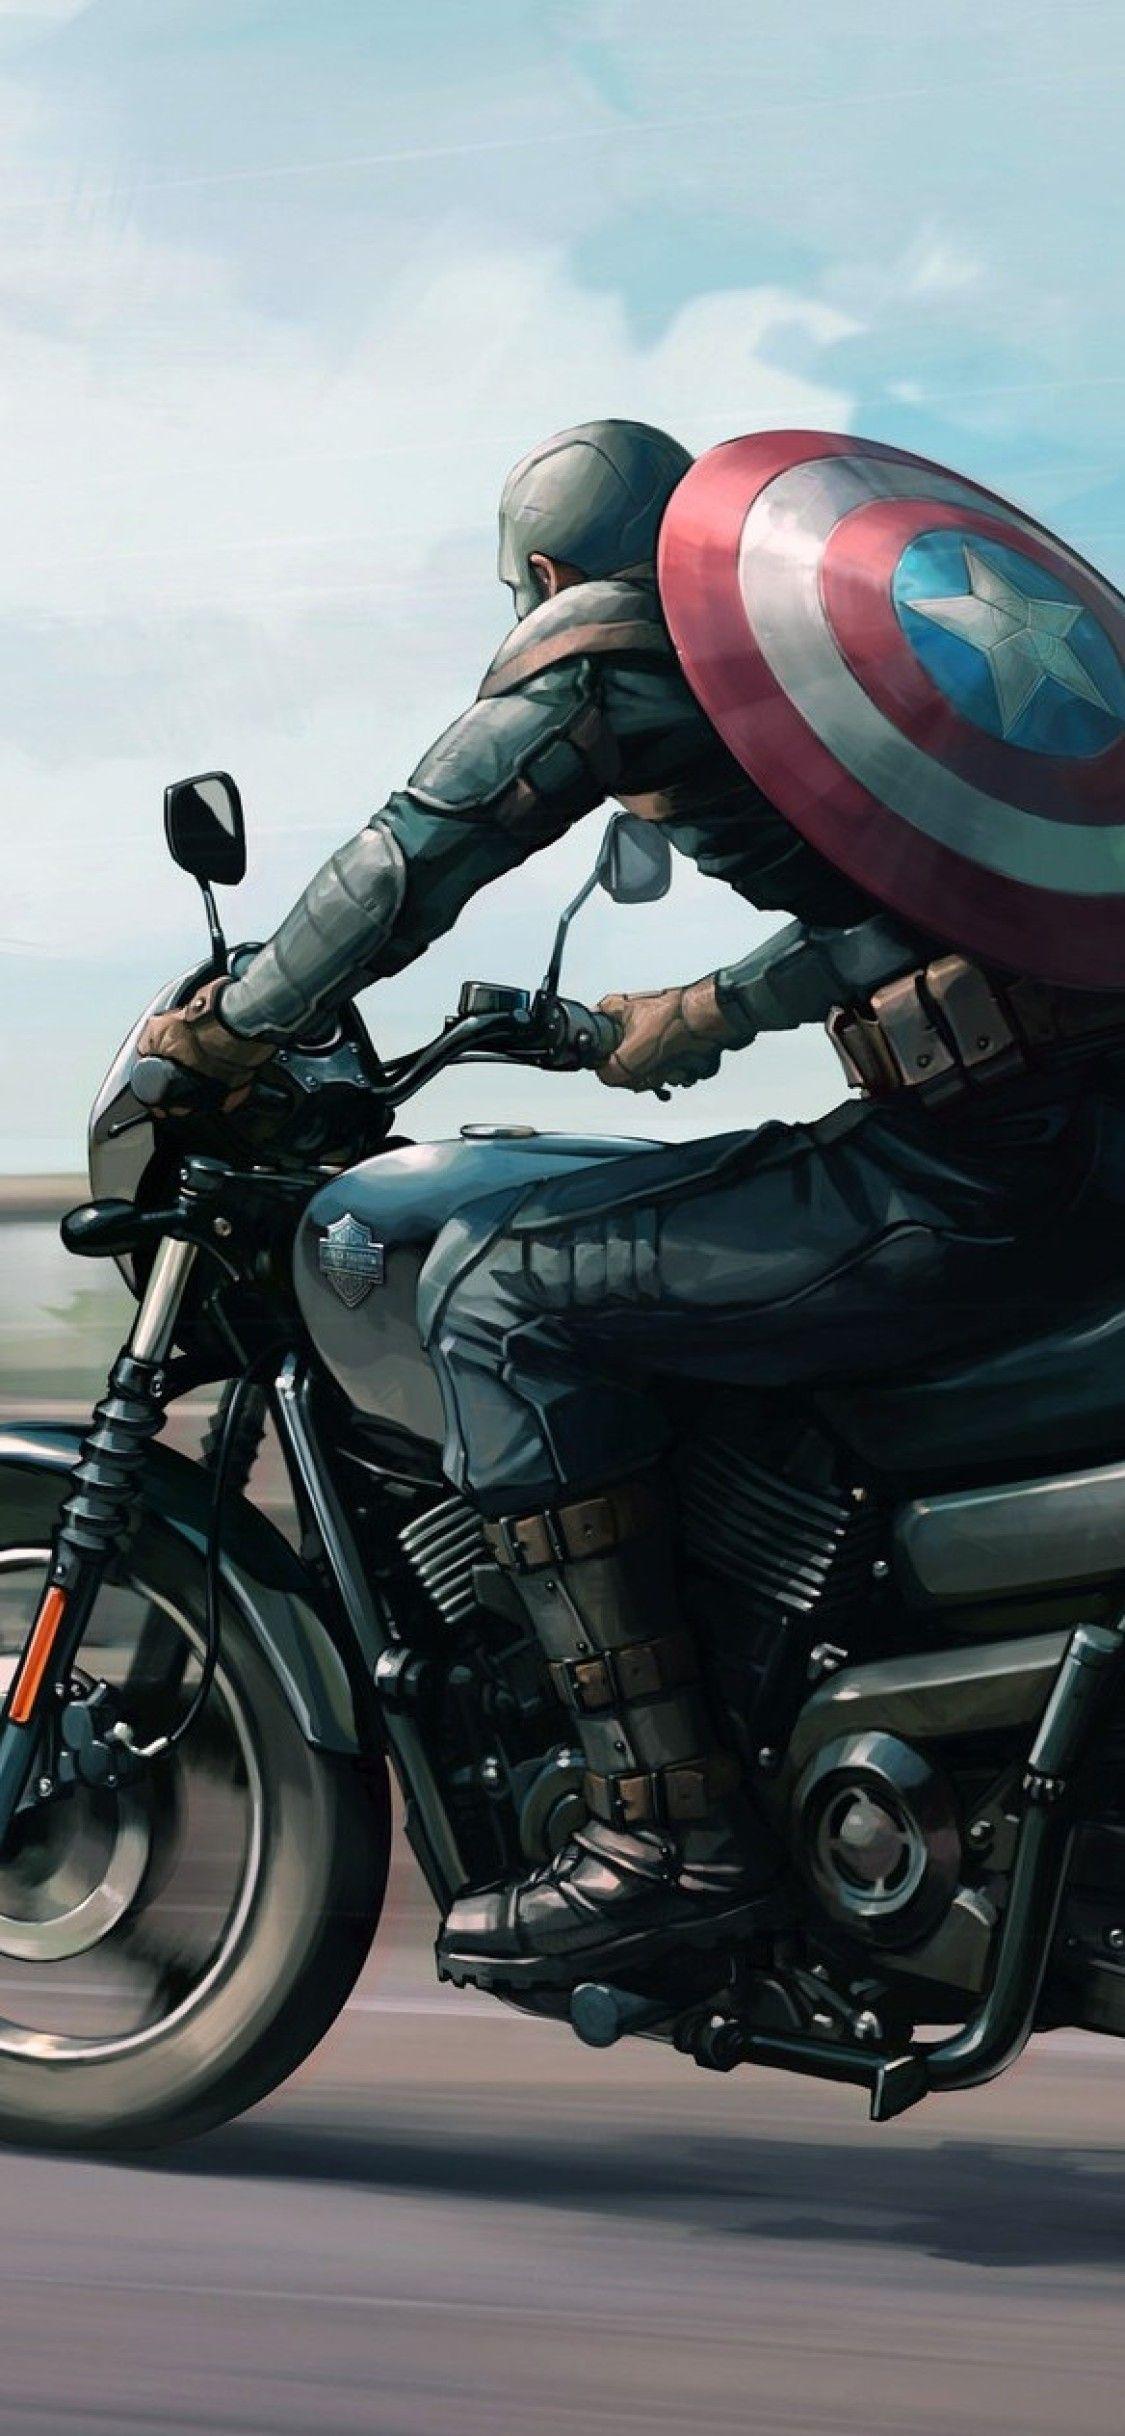 Harley Davidson Iphone Wallpaper In 2020 Captain America